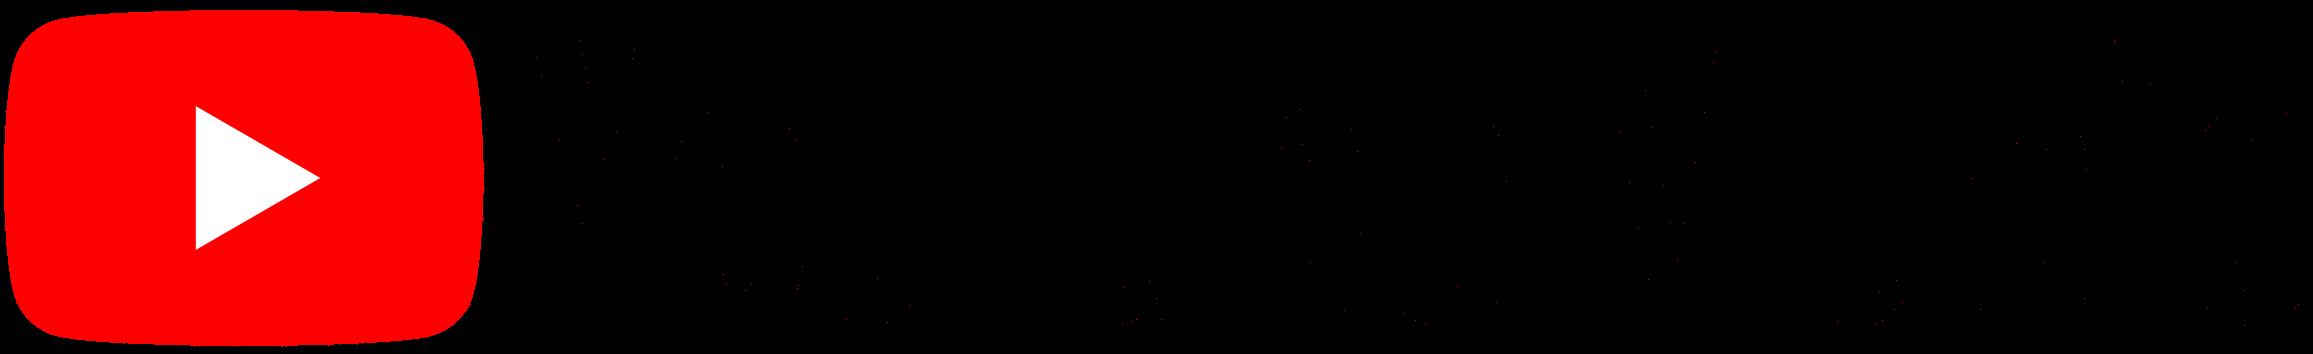 YouTube Music Logo.wine